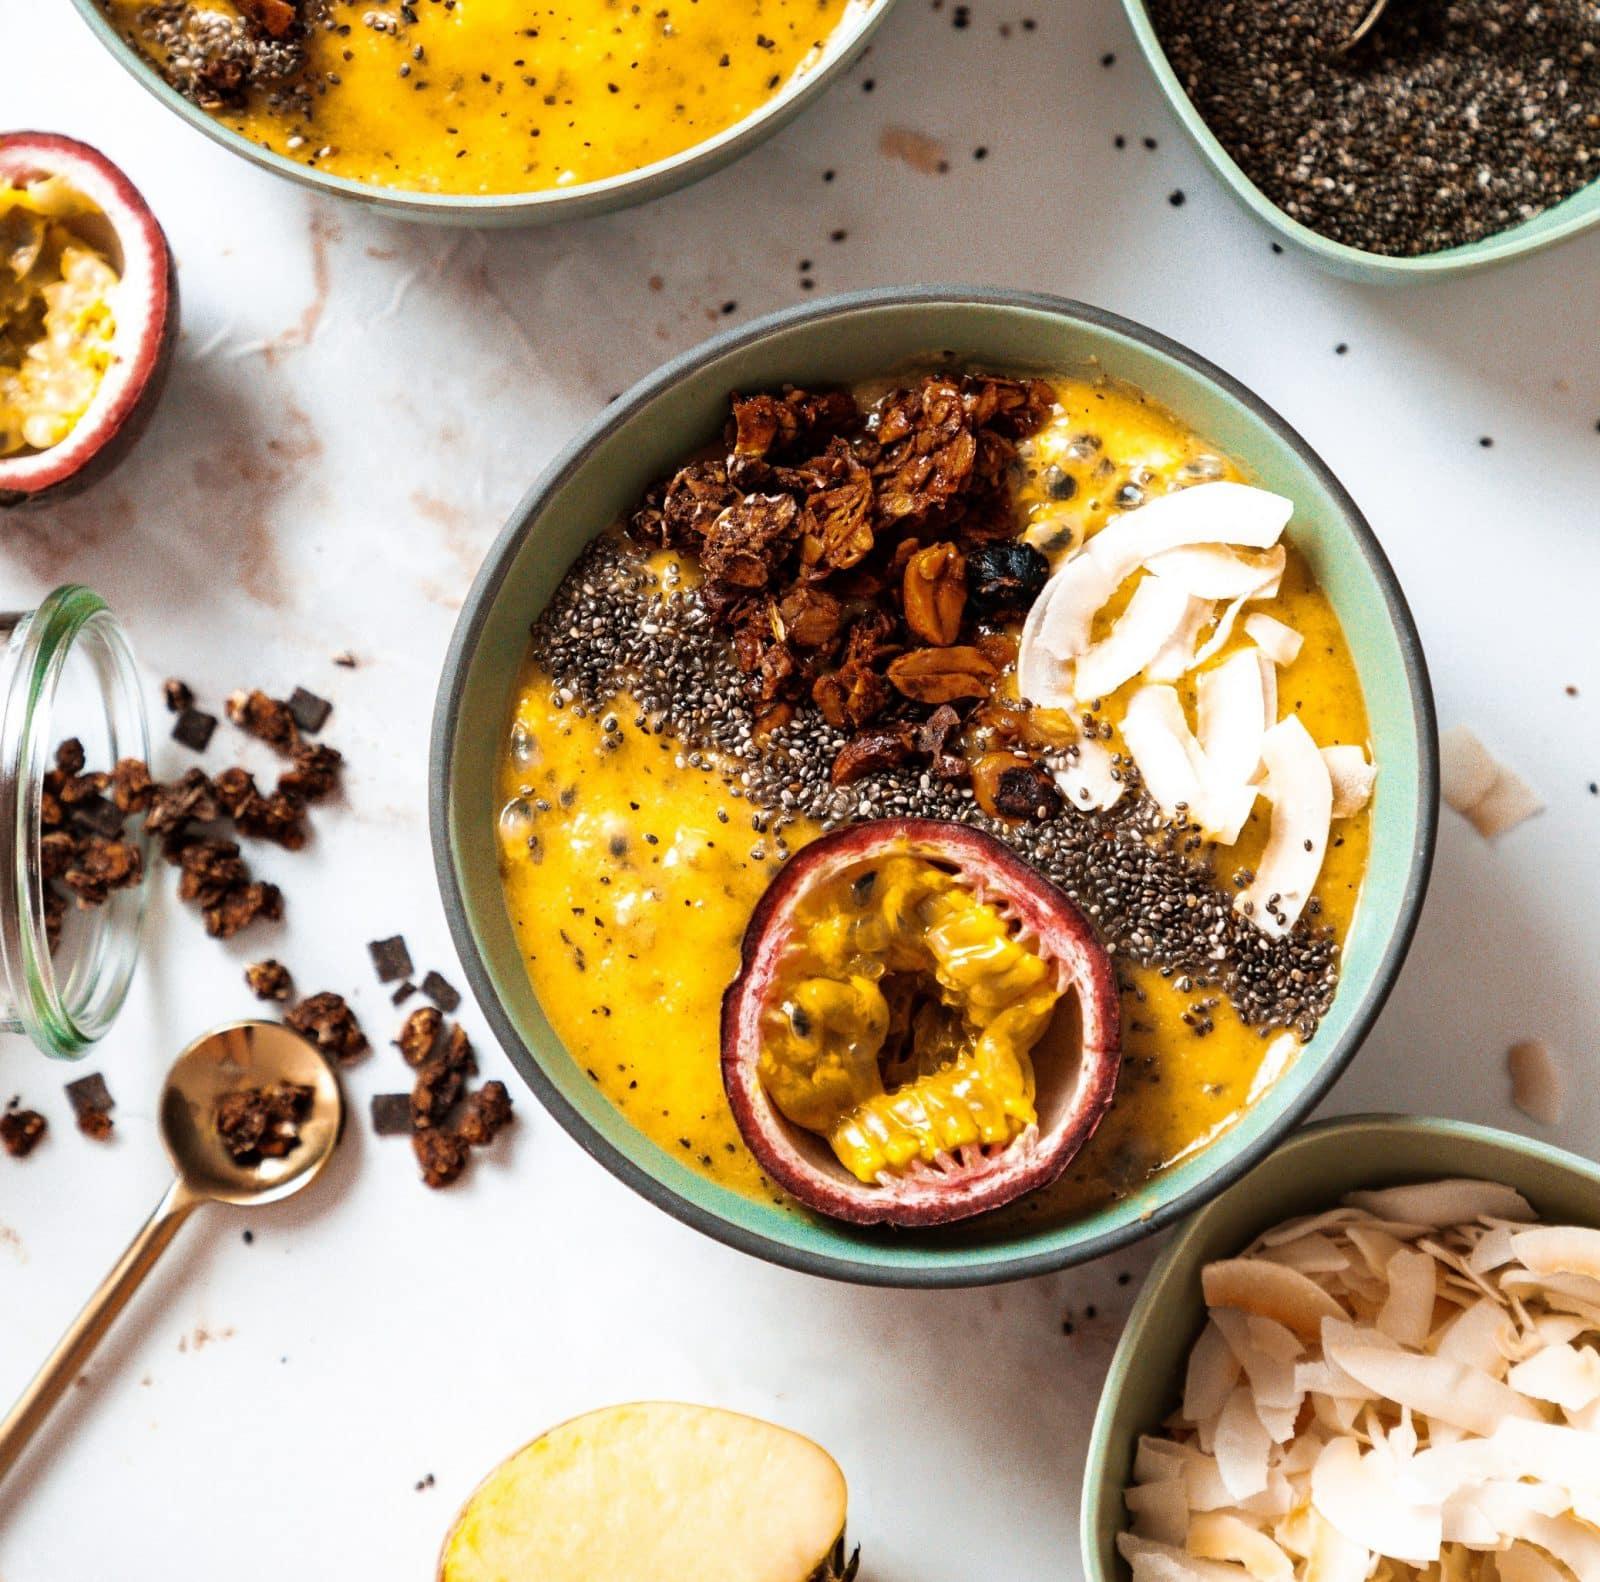 Tropical Smoothie-Bowl mit Kokosflakes, Granola und Passionsfrucht